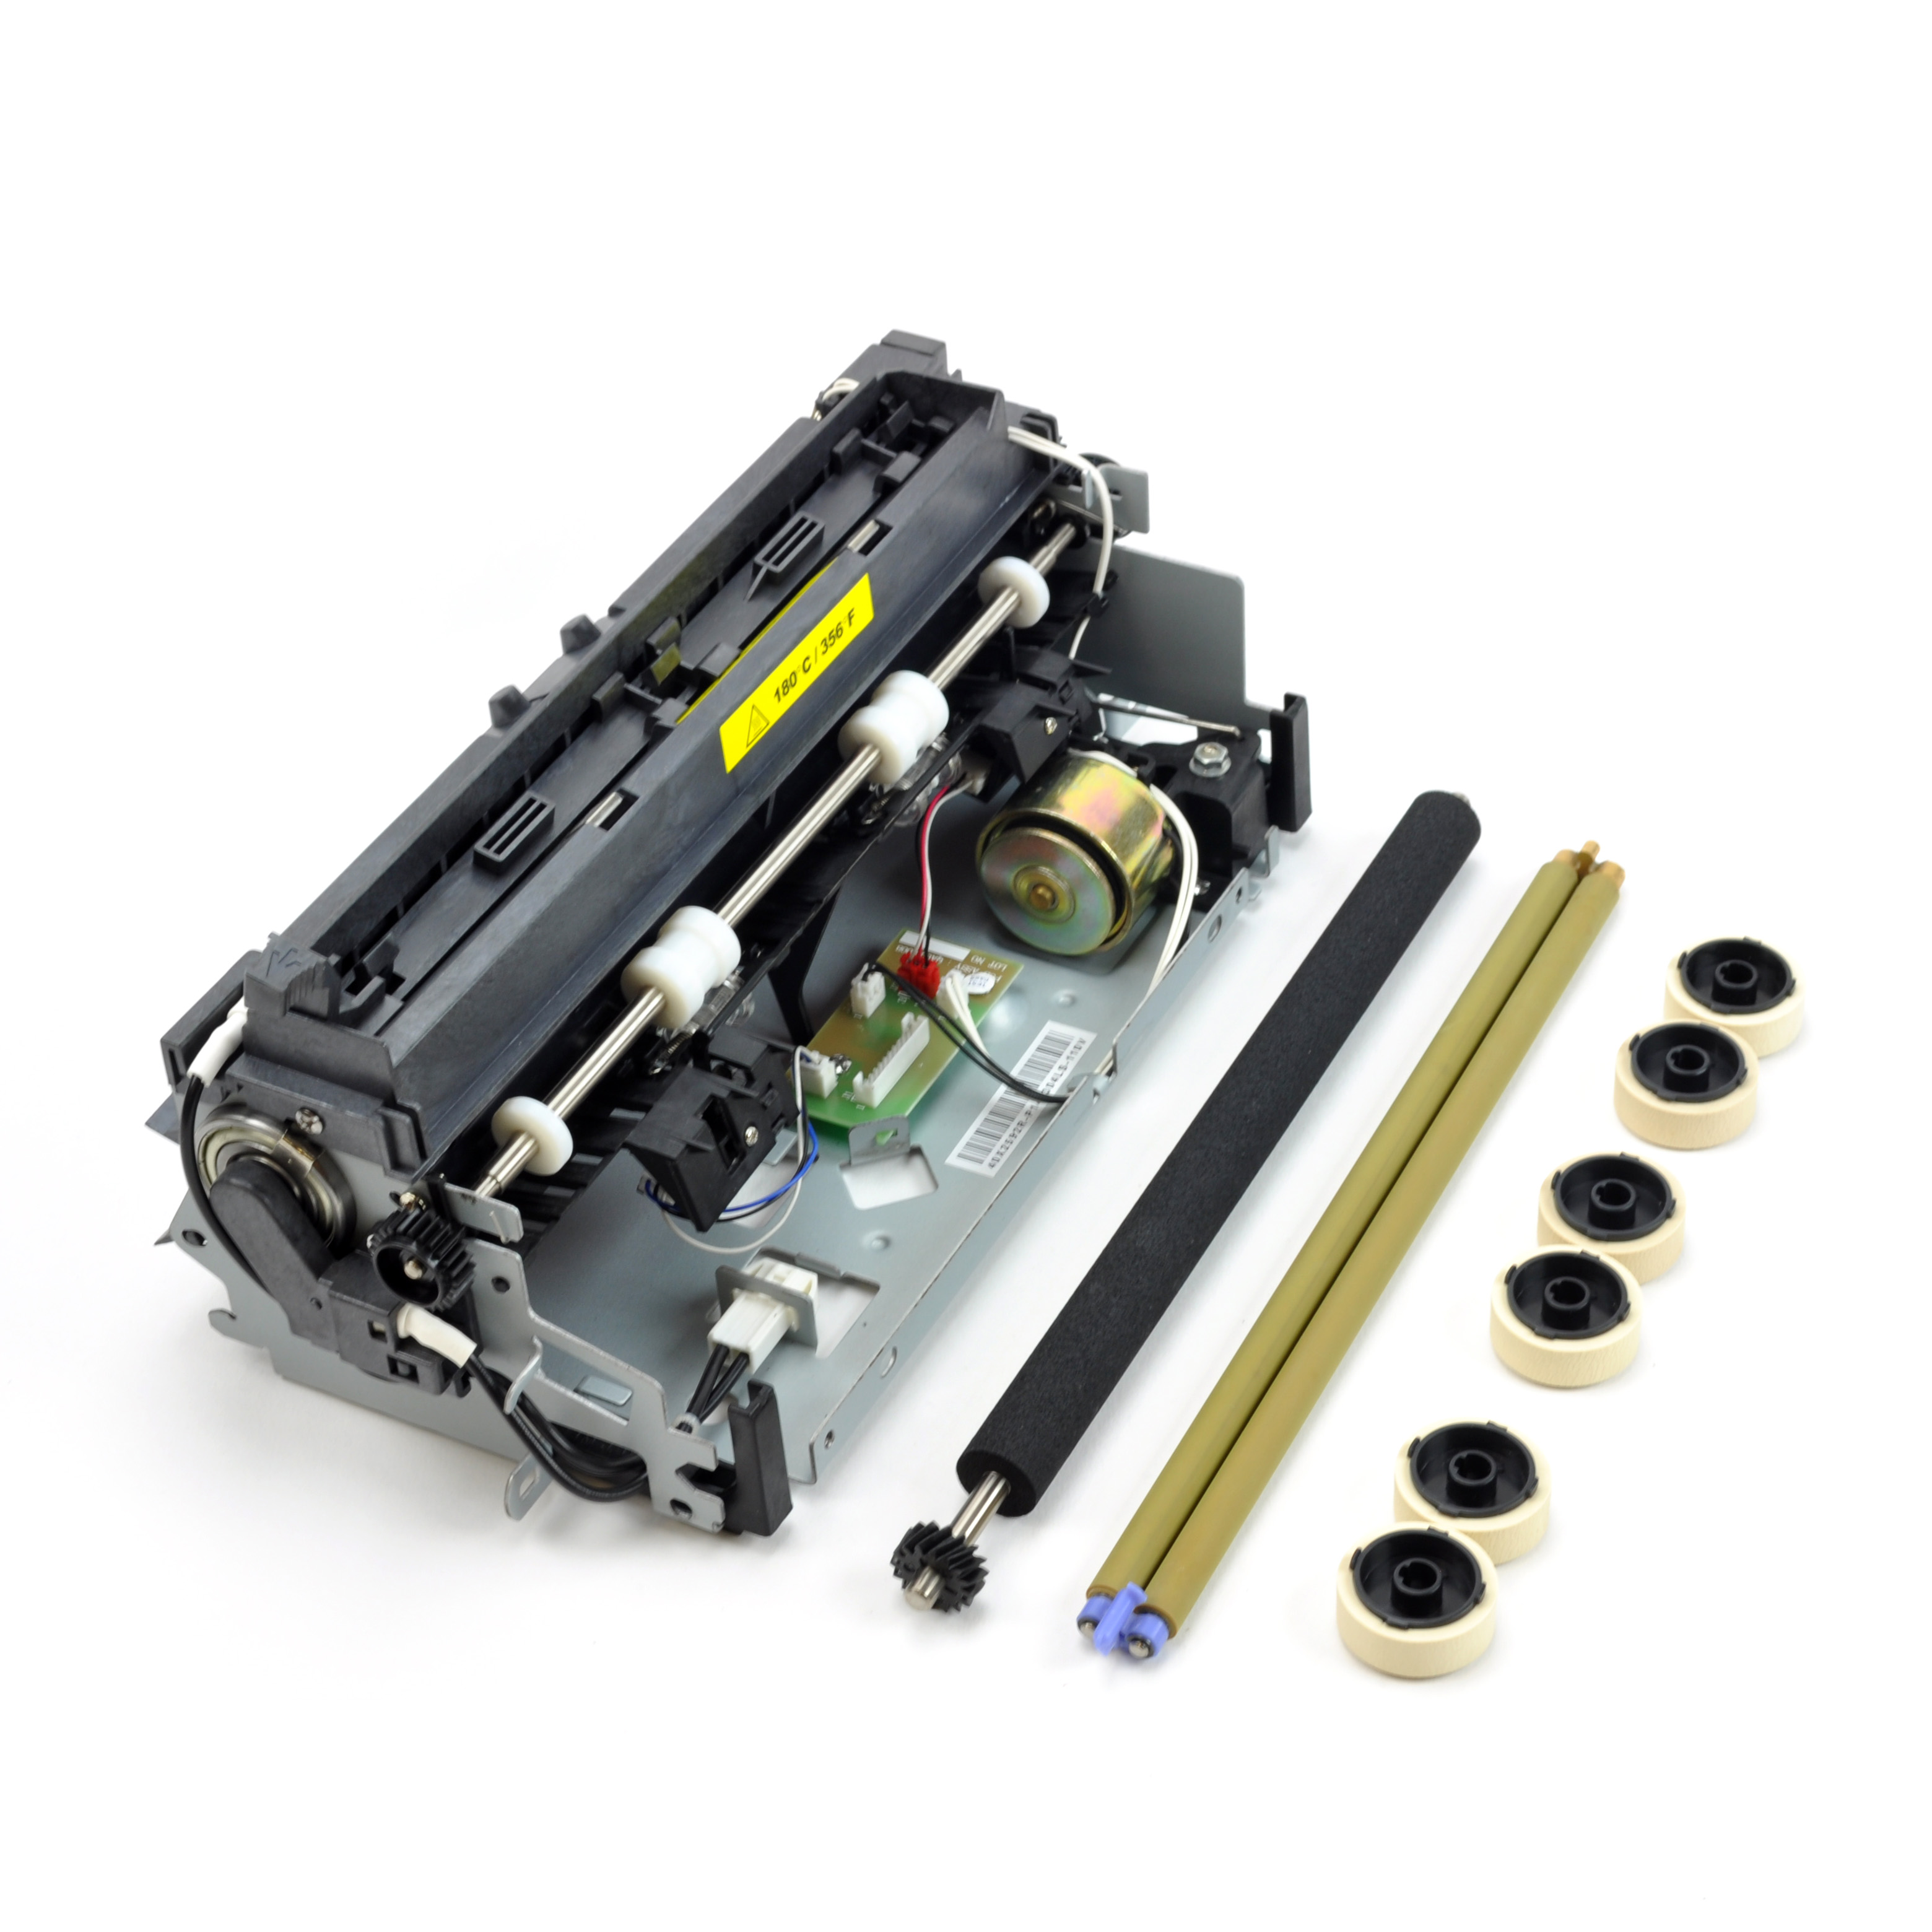 Partsmart Maintenance Kit for Lexmark printers: LexT64x (...